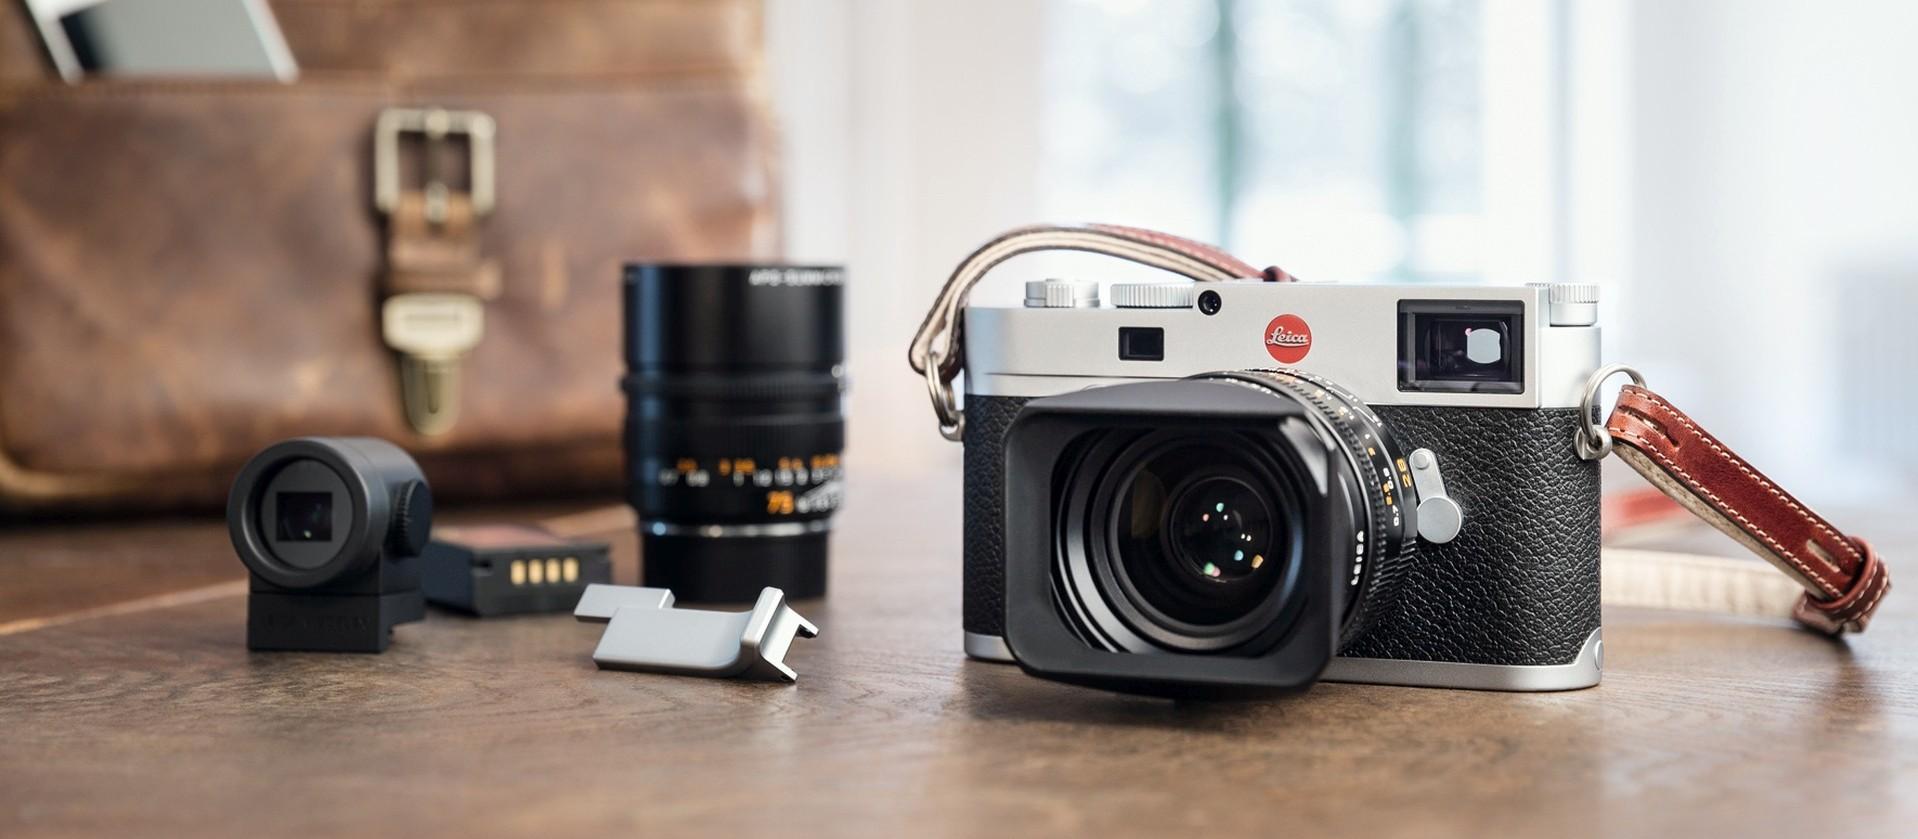 Ile bym dał za ten aparat… Oto nowa Leica M10